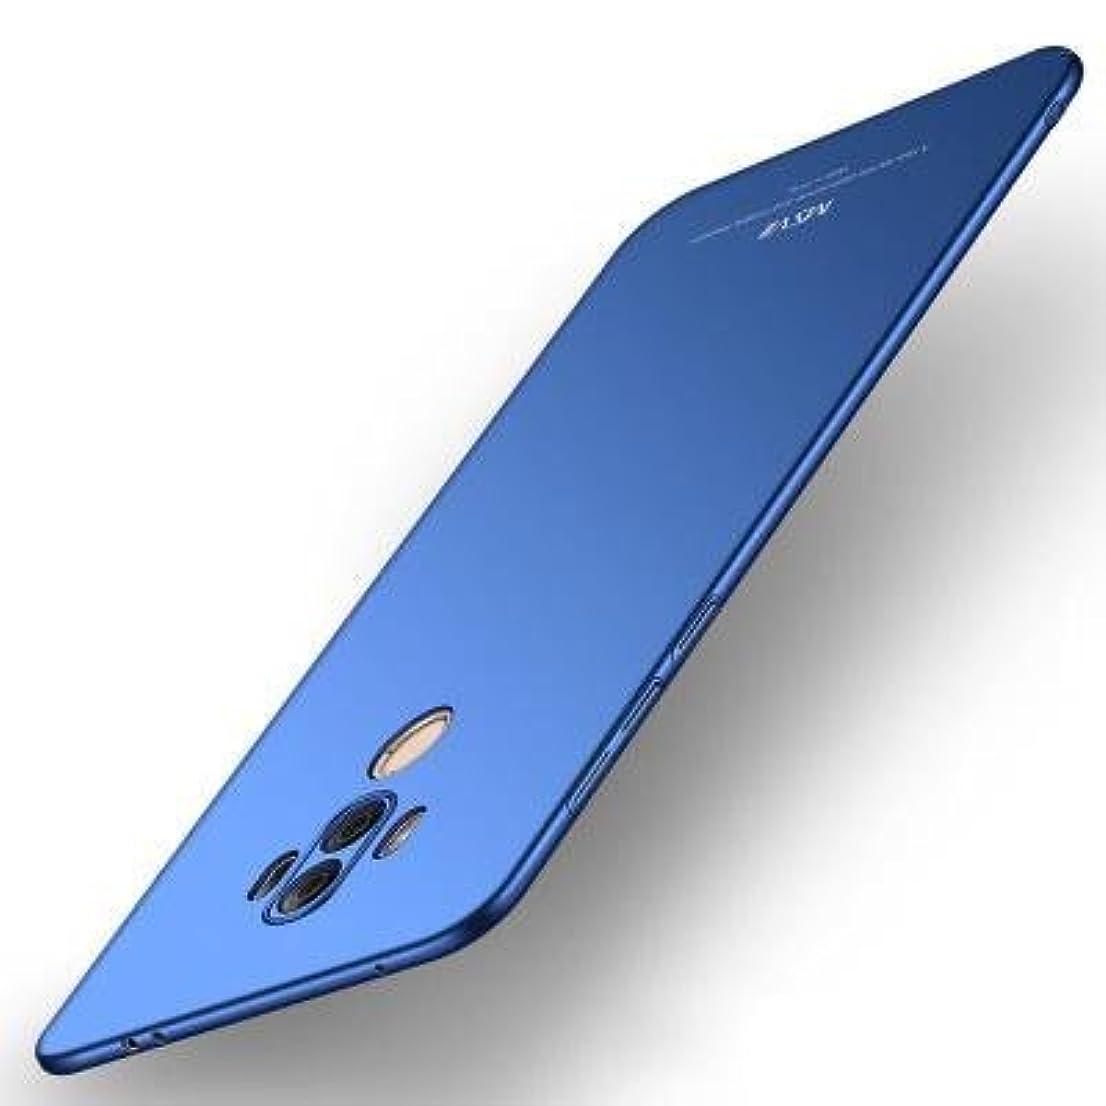 床一過性本土WeTop Huawei Mate 10 Proカバー 一体型 耐衝撃 薄型 軽量 (ブルー)